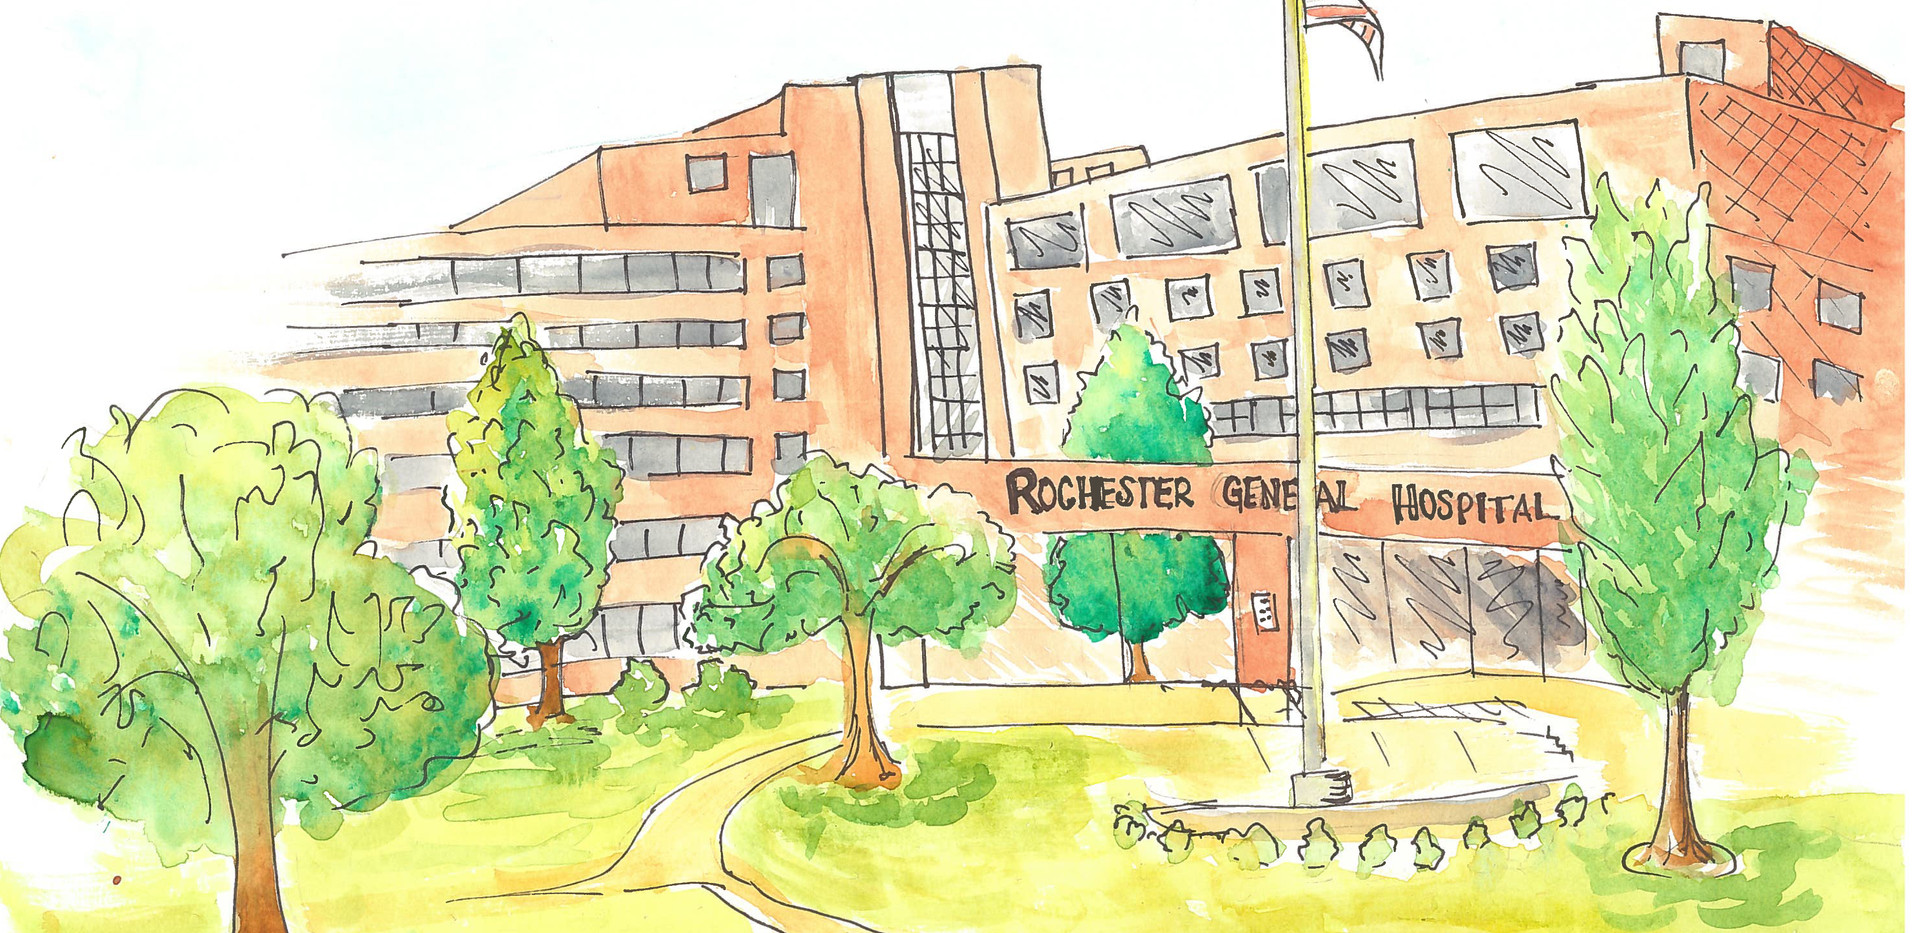 Rochester General Hospital